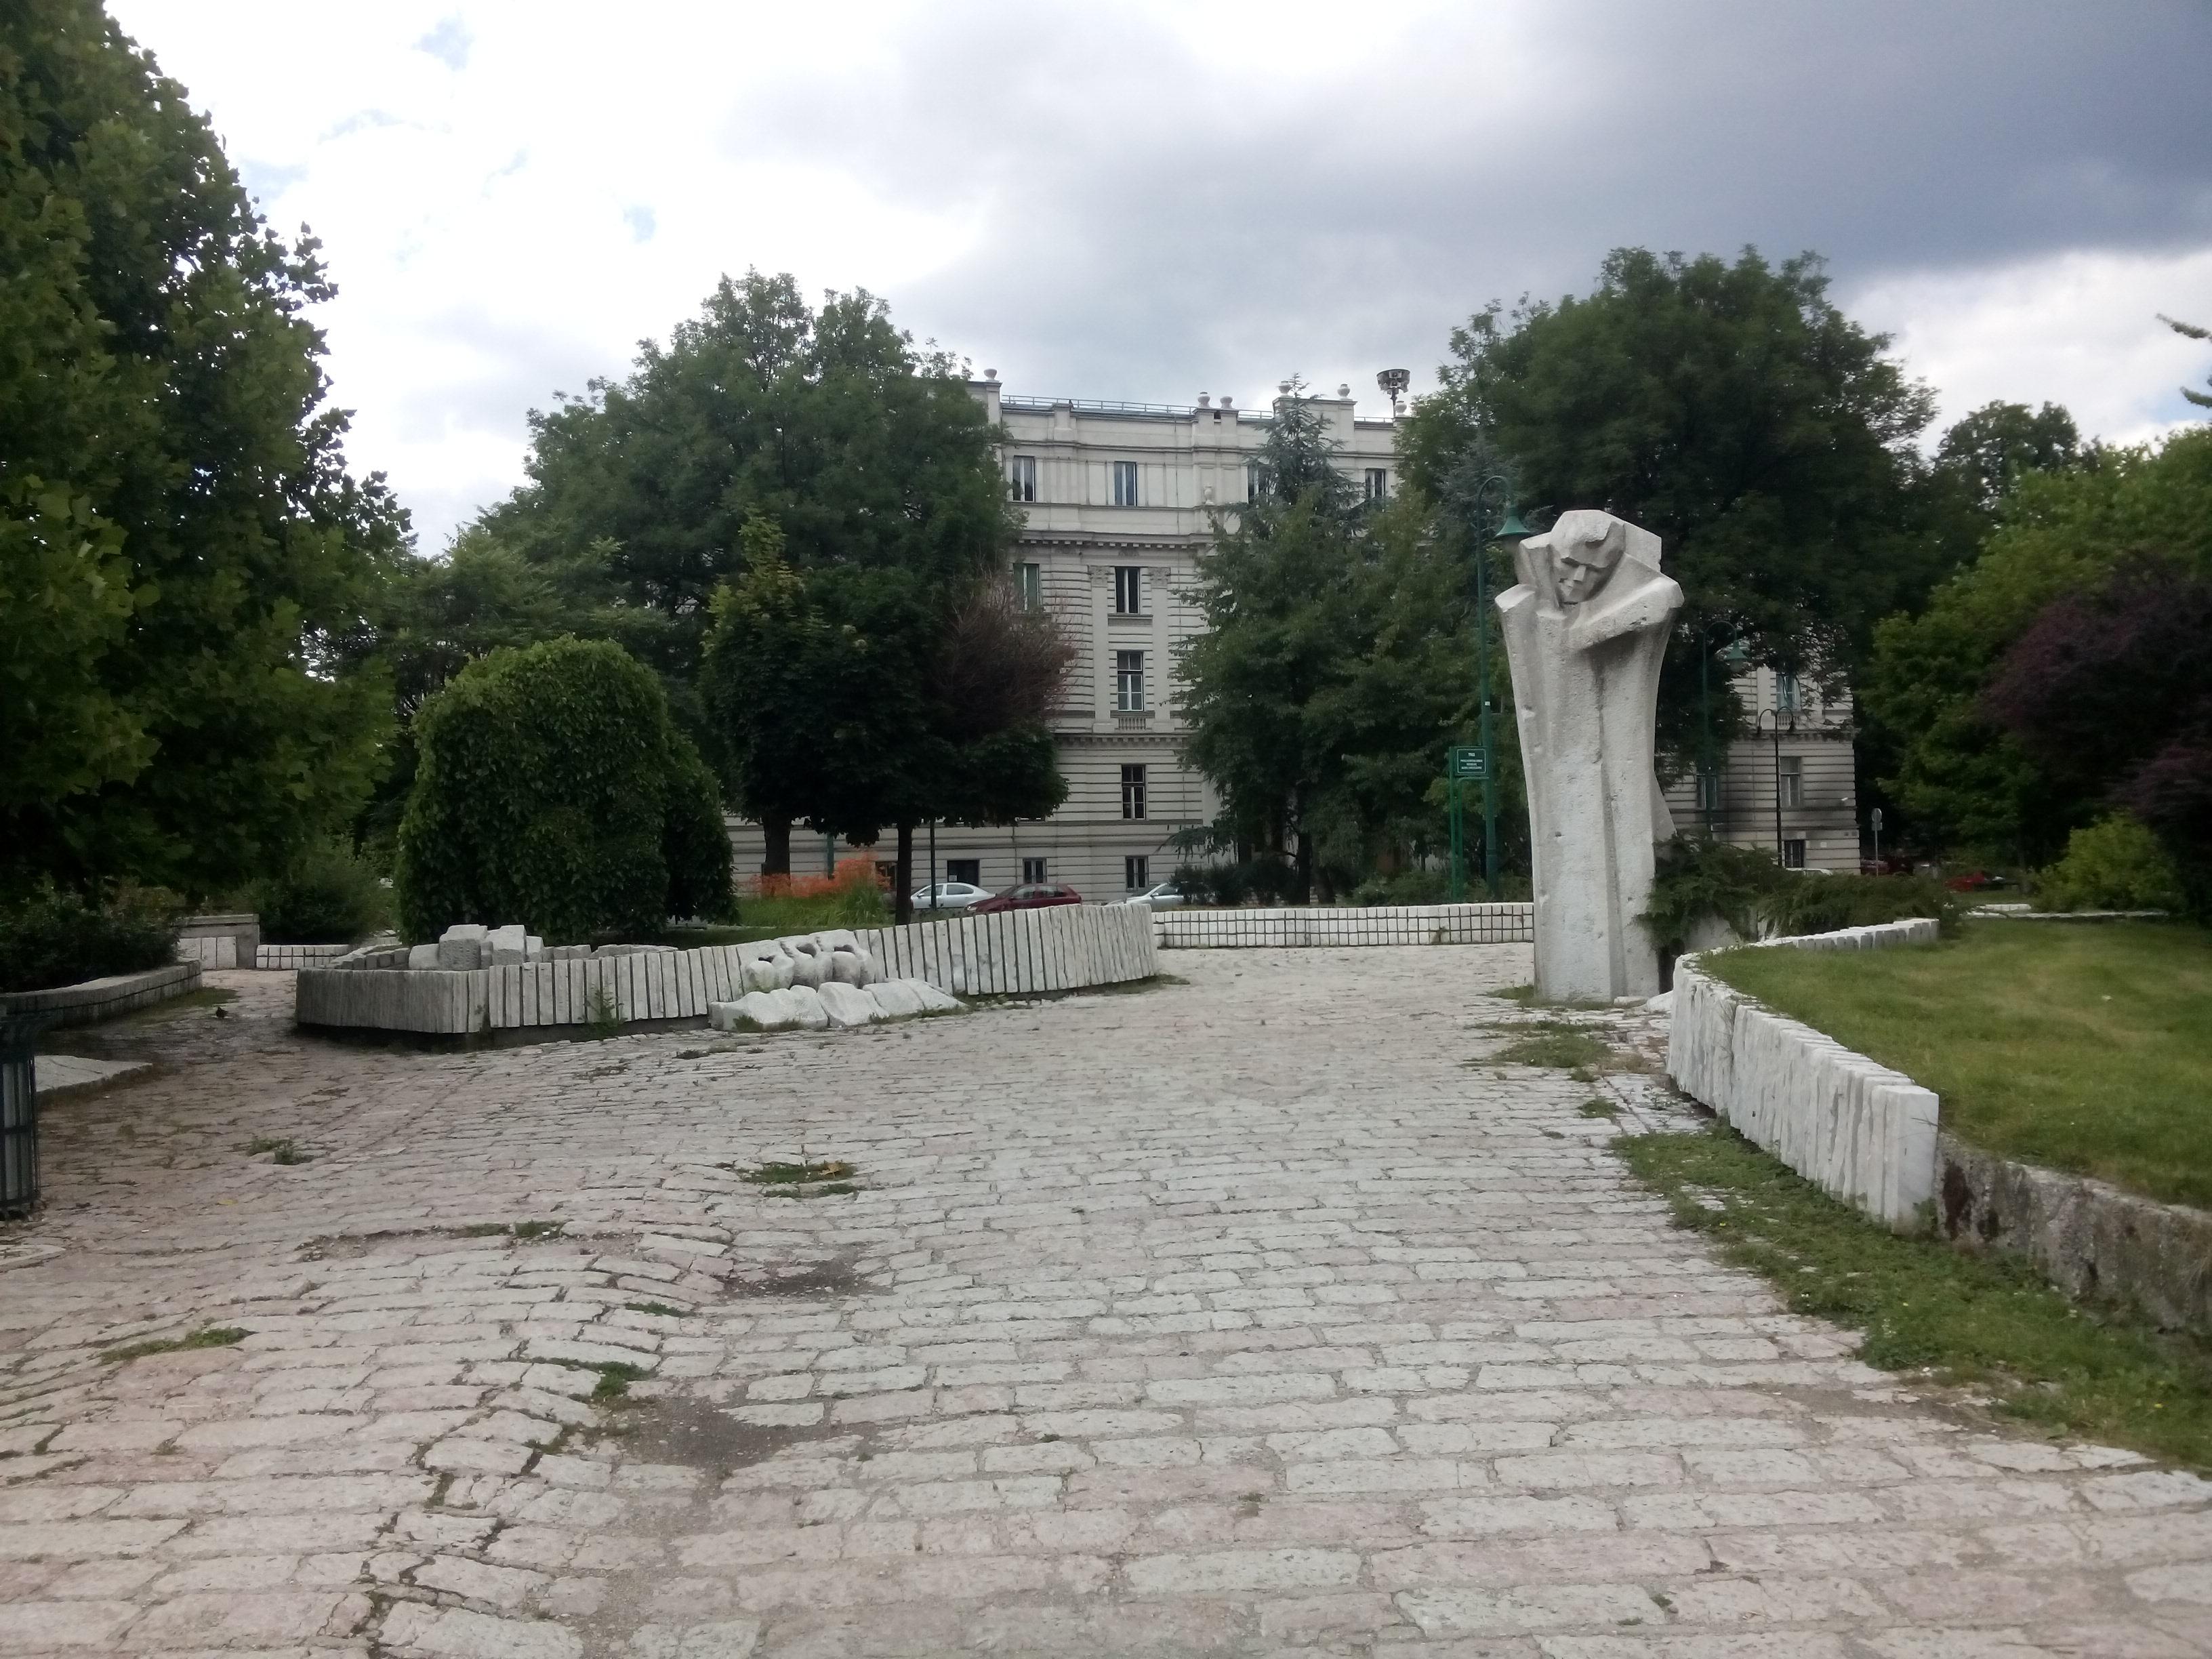 https://i.amy.gy/2017-sarajevo/IMG_20170617_163438.jpg